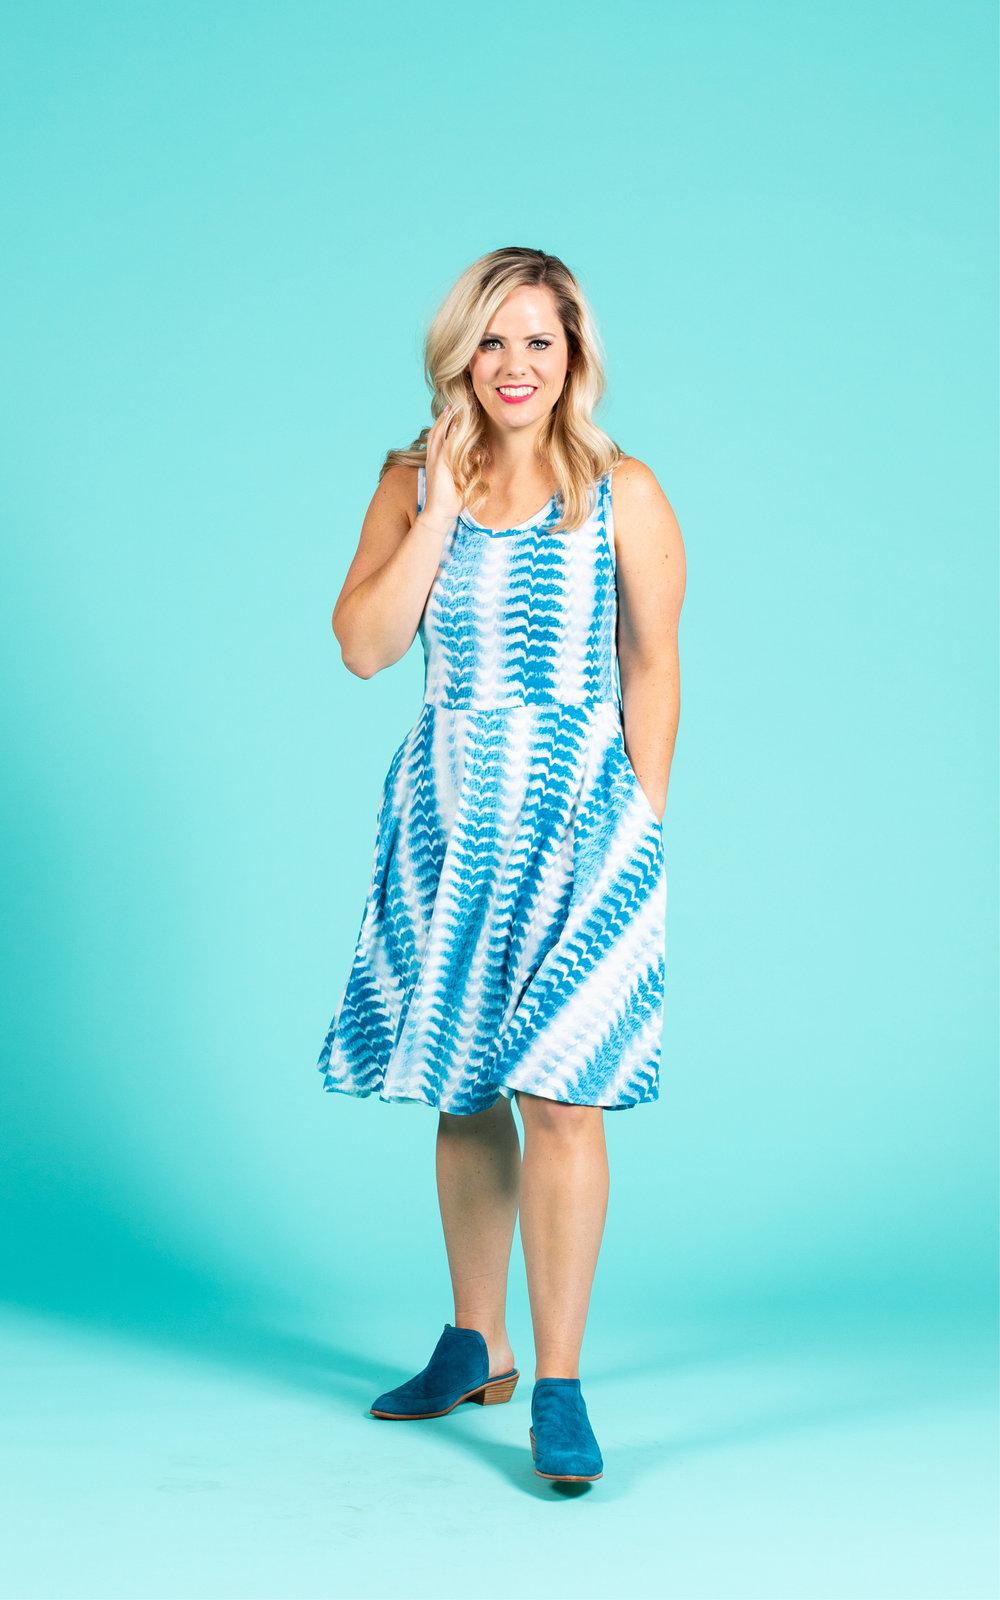 LULAROE-SLEEVELESS-DRESS-NICKI-A LINE SKIRT-BLUE AND WHITE PRINT.jpg